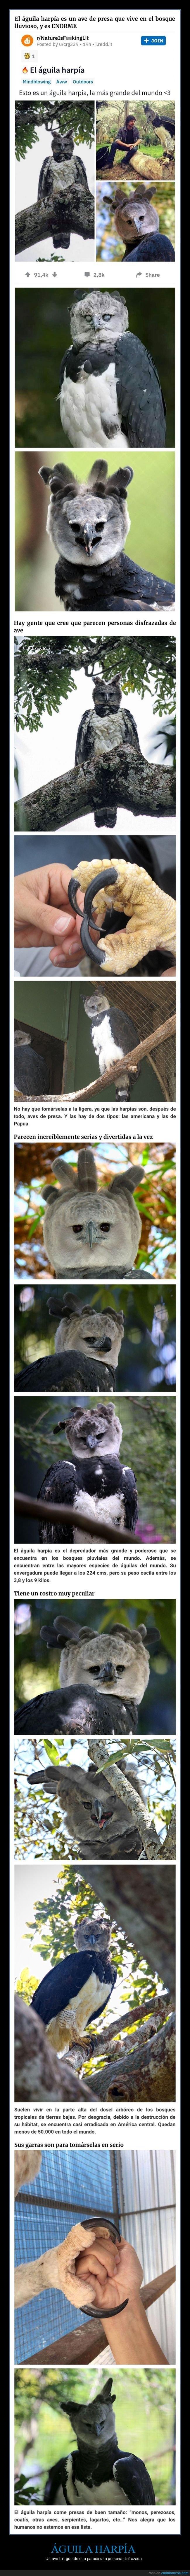 águila,águila harpía,curiosidades,grande